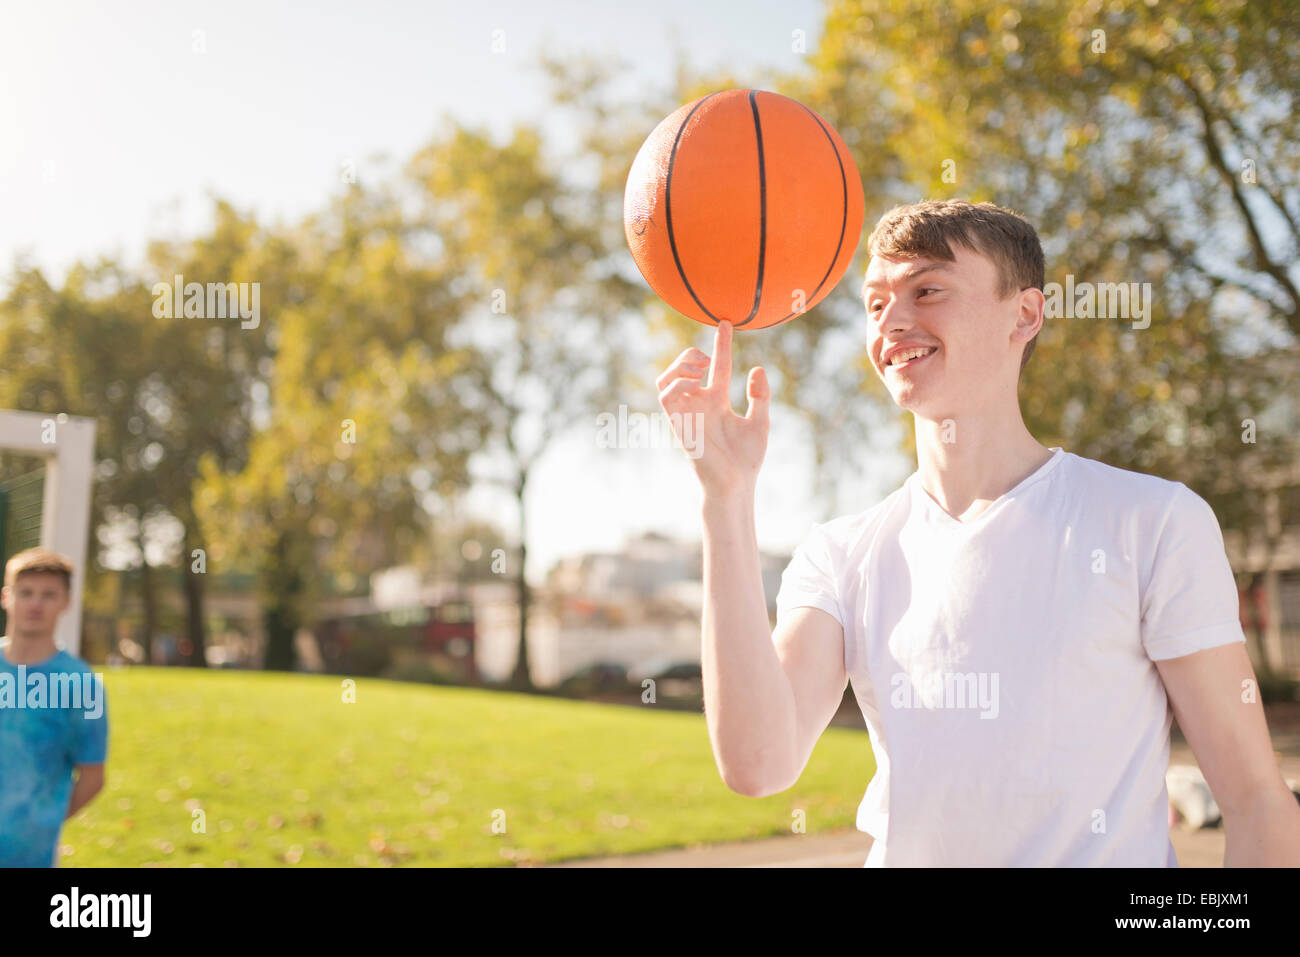 Smiling young male basketball player balancing basketball on finger - Stock Image